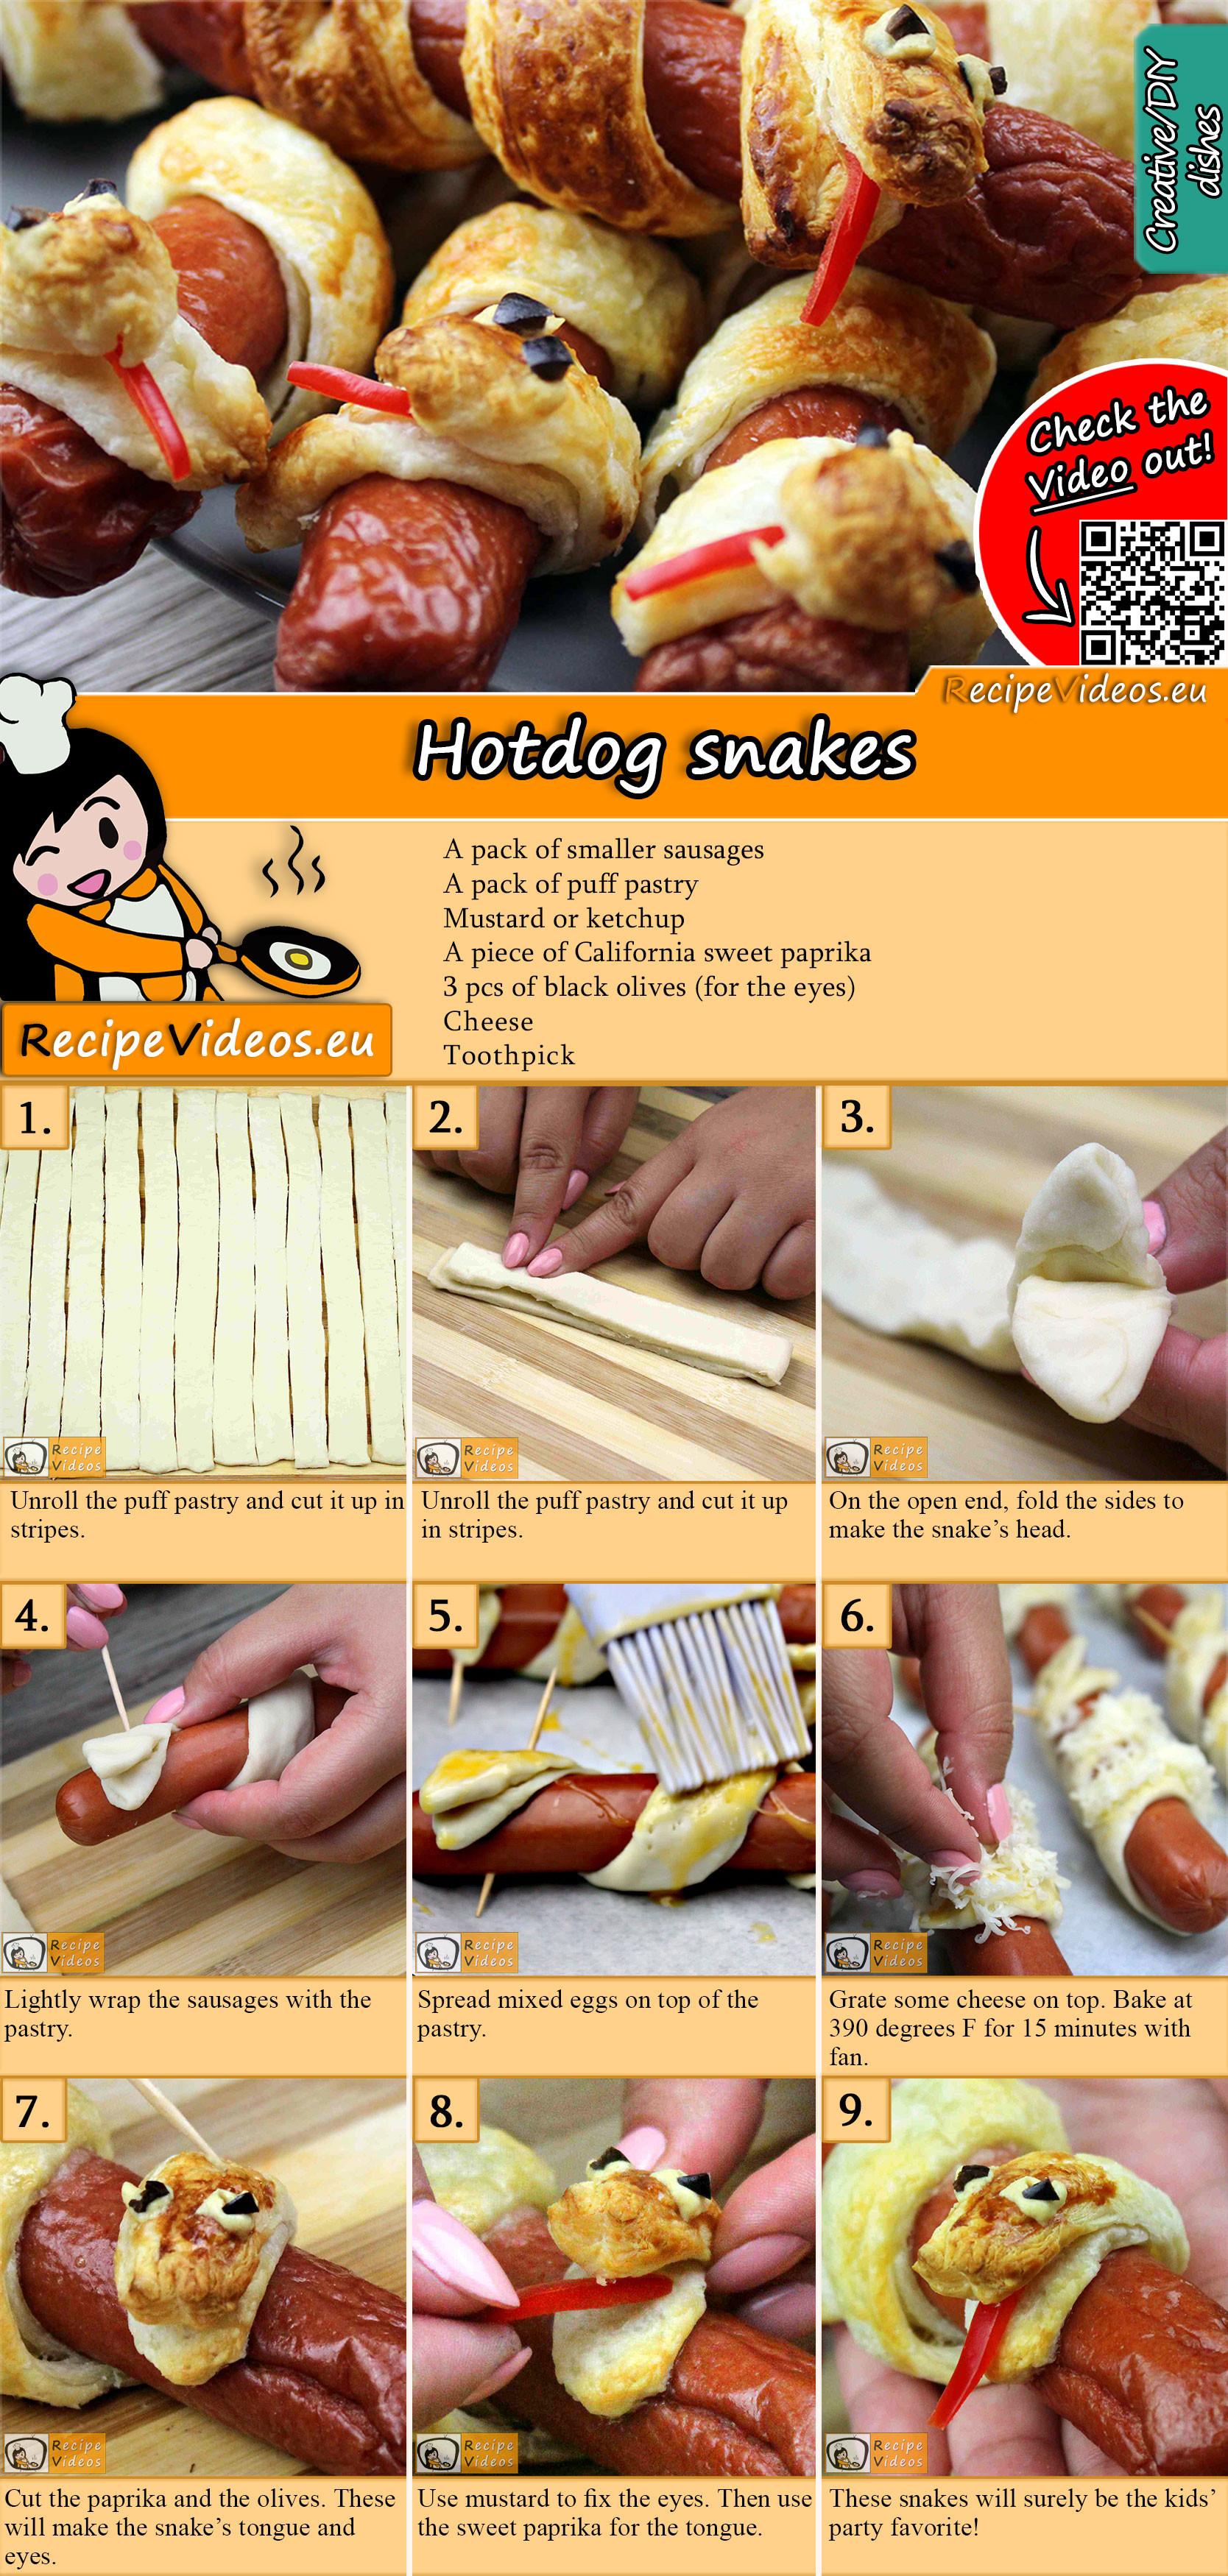 Hotdog snakes recipe with video